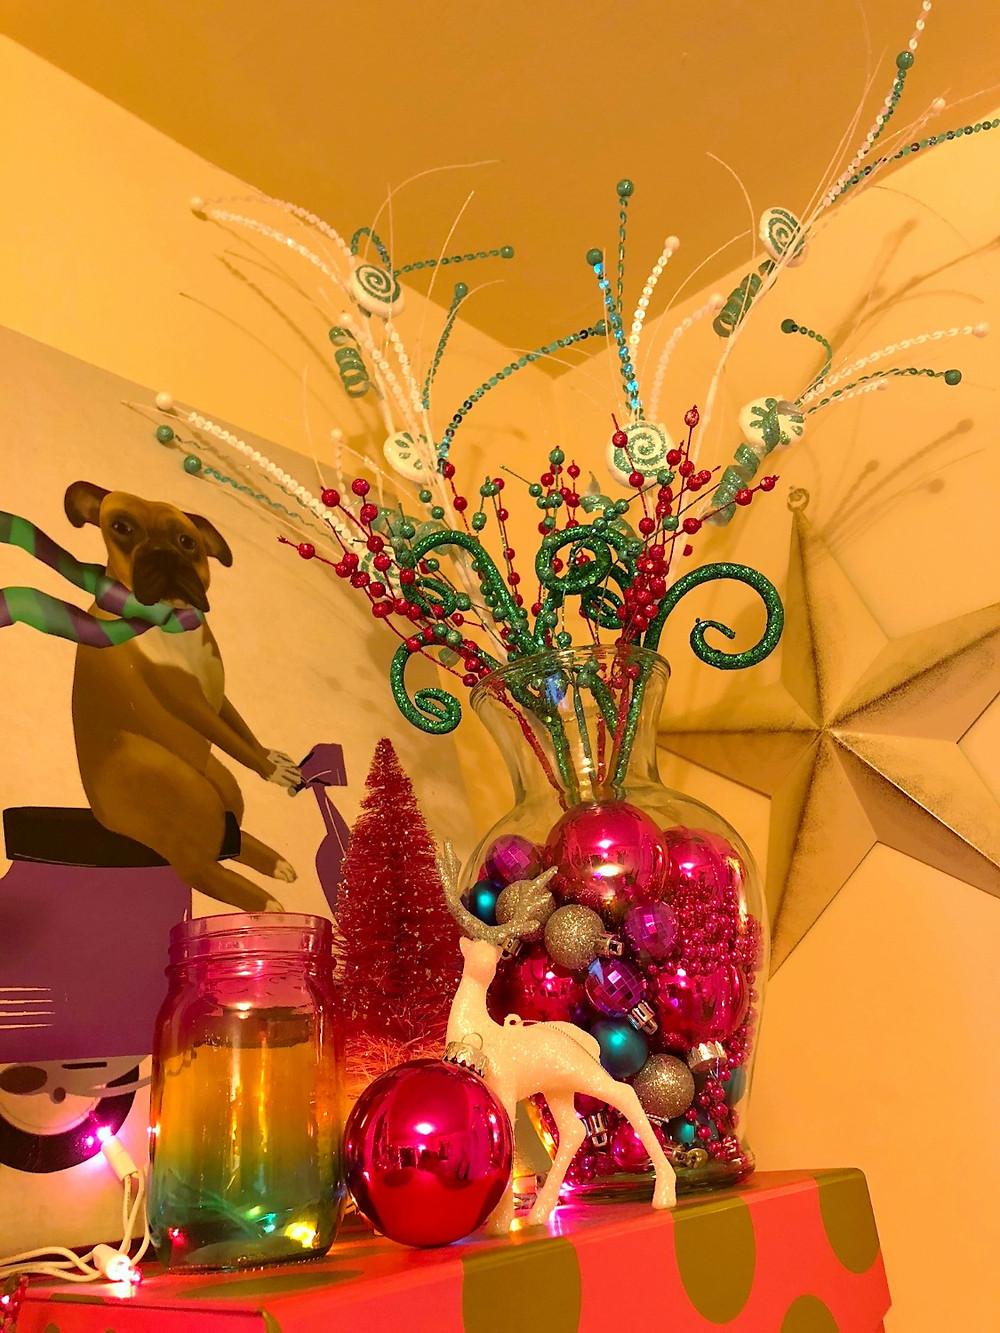 Alycia Yerves home office Christmas decor 2017 candyland knick knacks